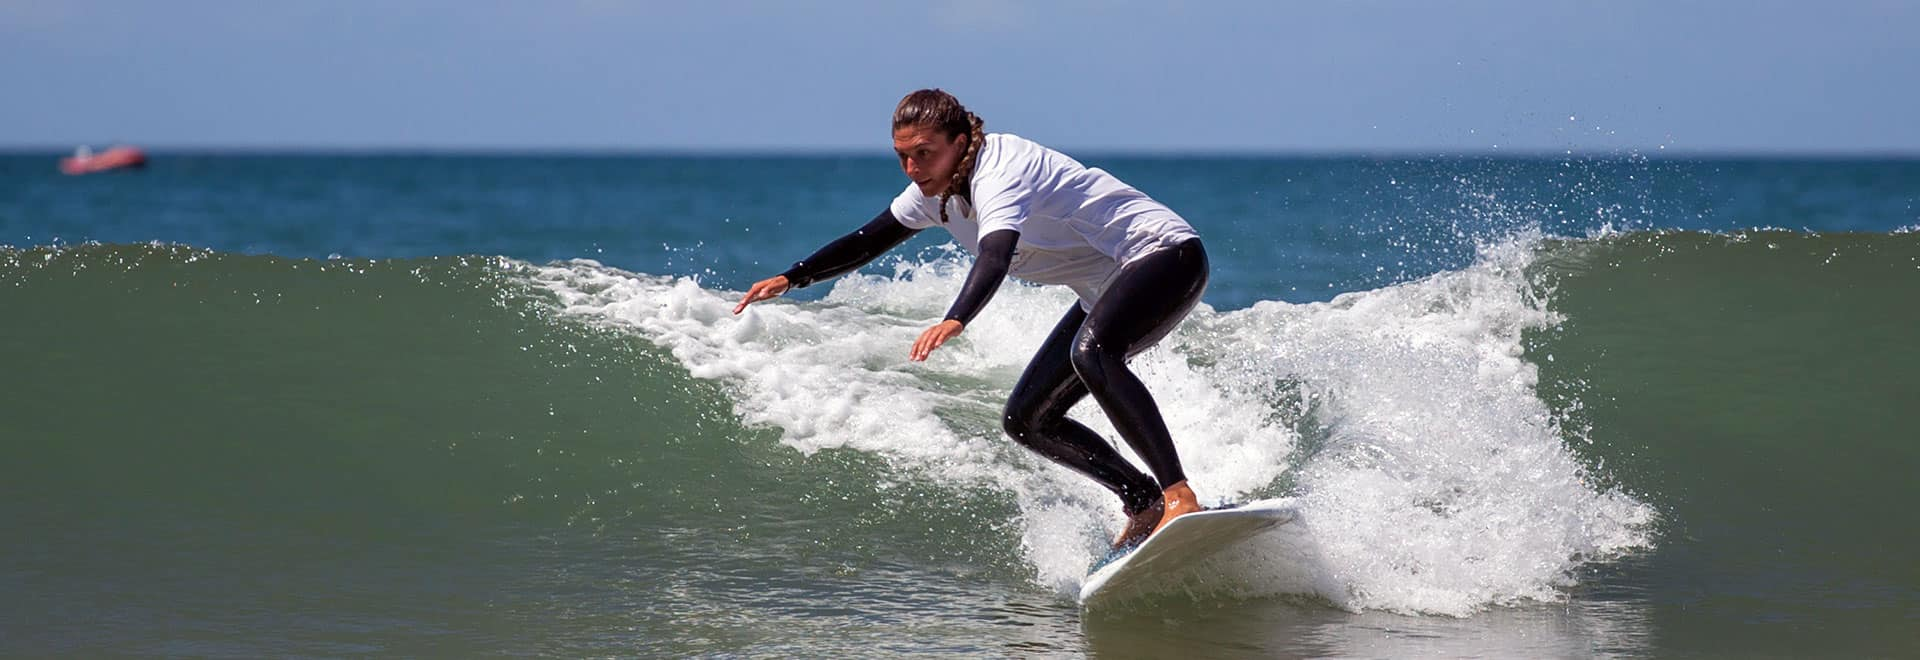 surf lesson intermediate lisbon algarve